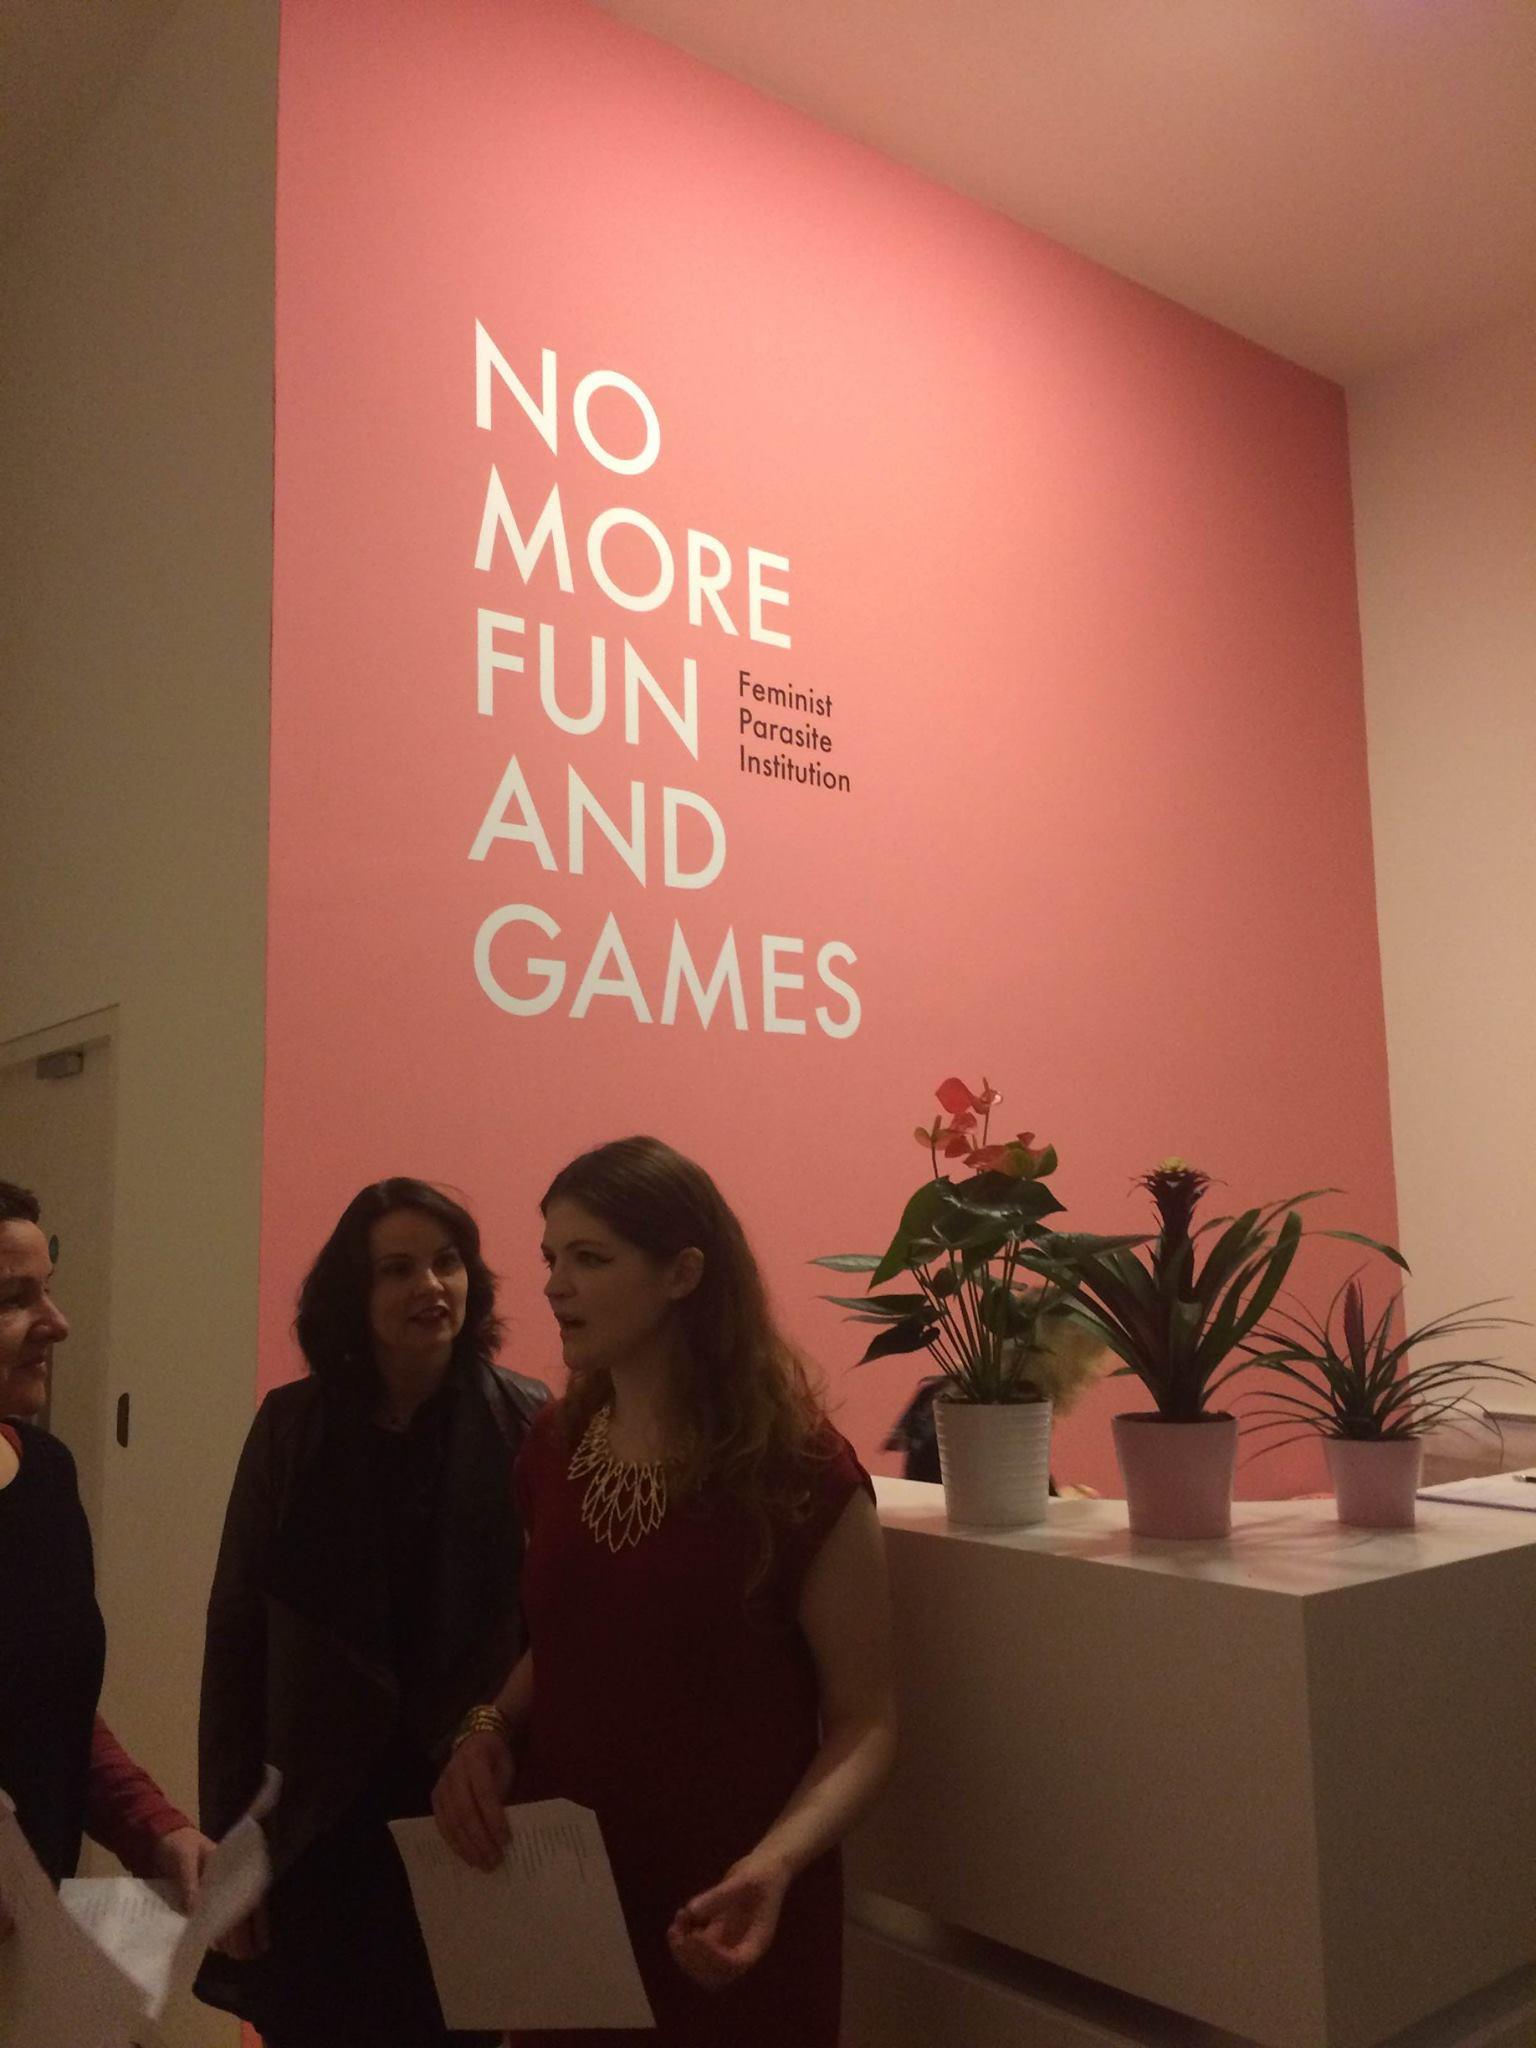 No more fun and games, Feminist Parasite Institution, Jesse Jones at The Hugh Lane Gallery